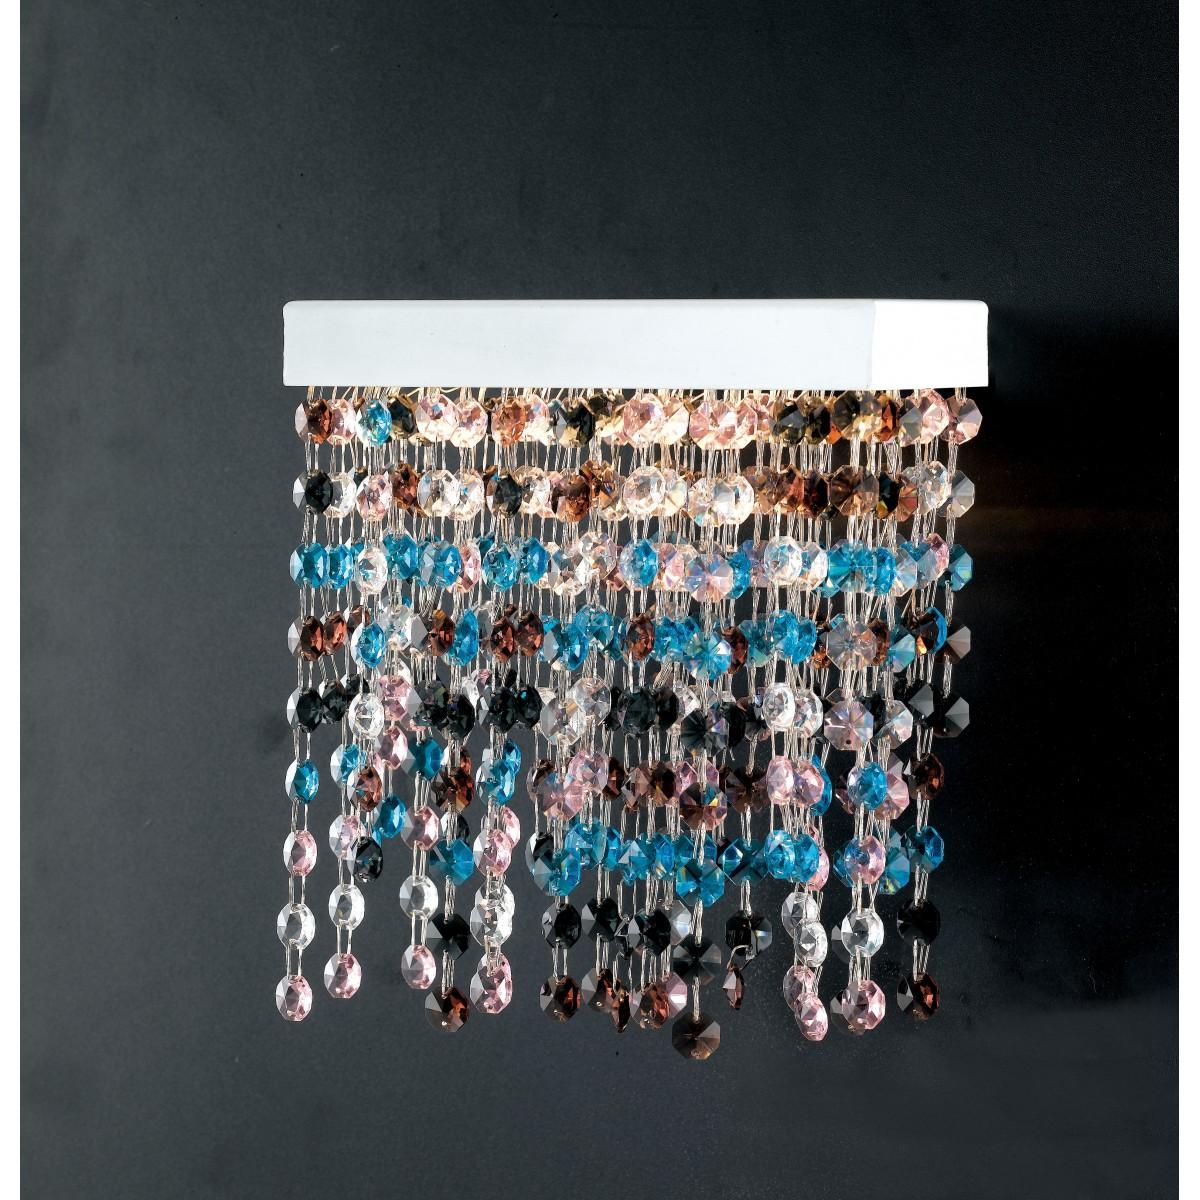 LED-LUXURY-AP - Applique Metallo Bianco Pendenti Cristalli Multicolor Lampada Moderna Led 25 watt Luce Naturale